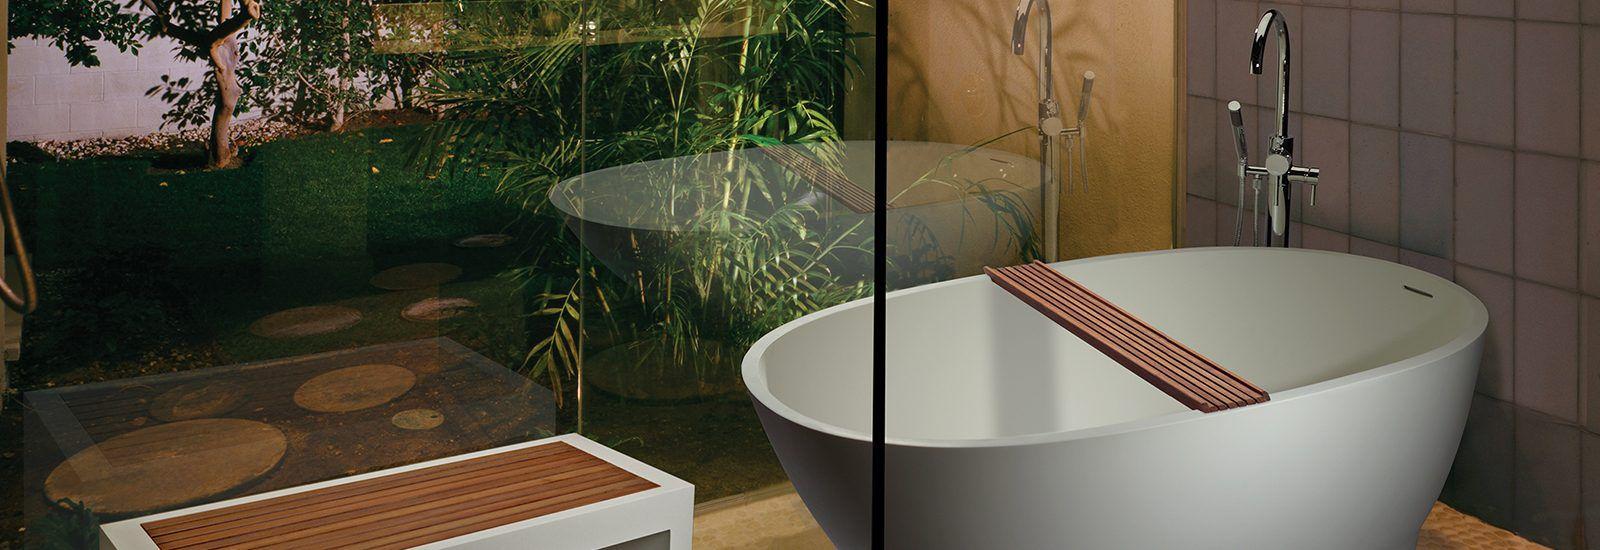 RM Living Cincinnati Contemporary Bathrooms By MTI